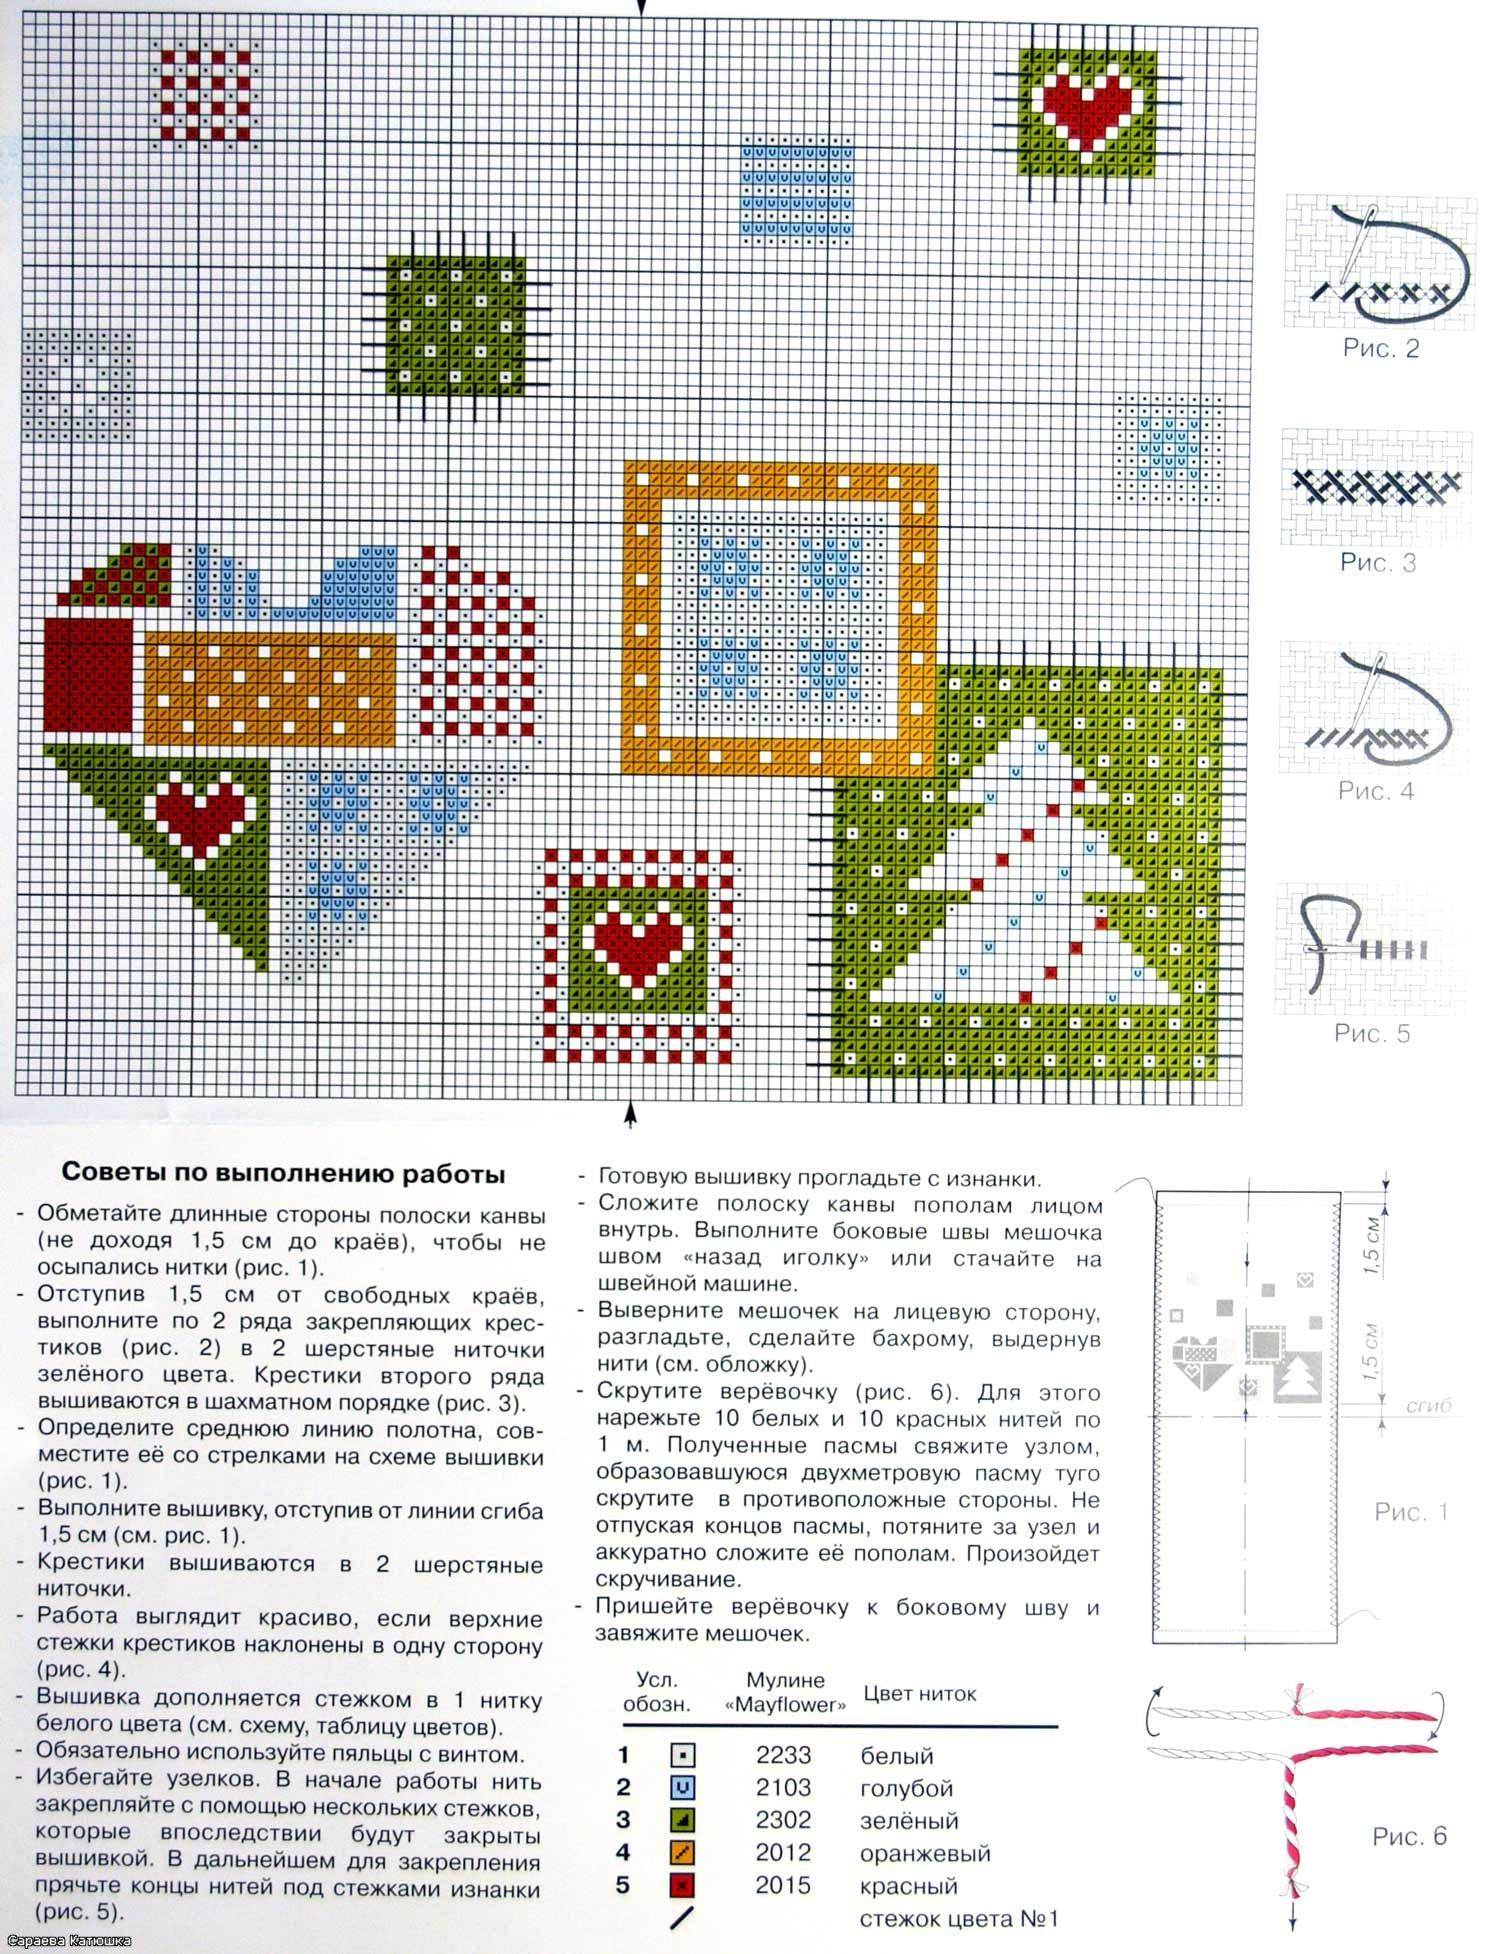 christmas craft ideas: embroidered gift bag